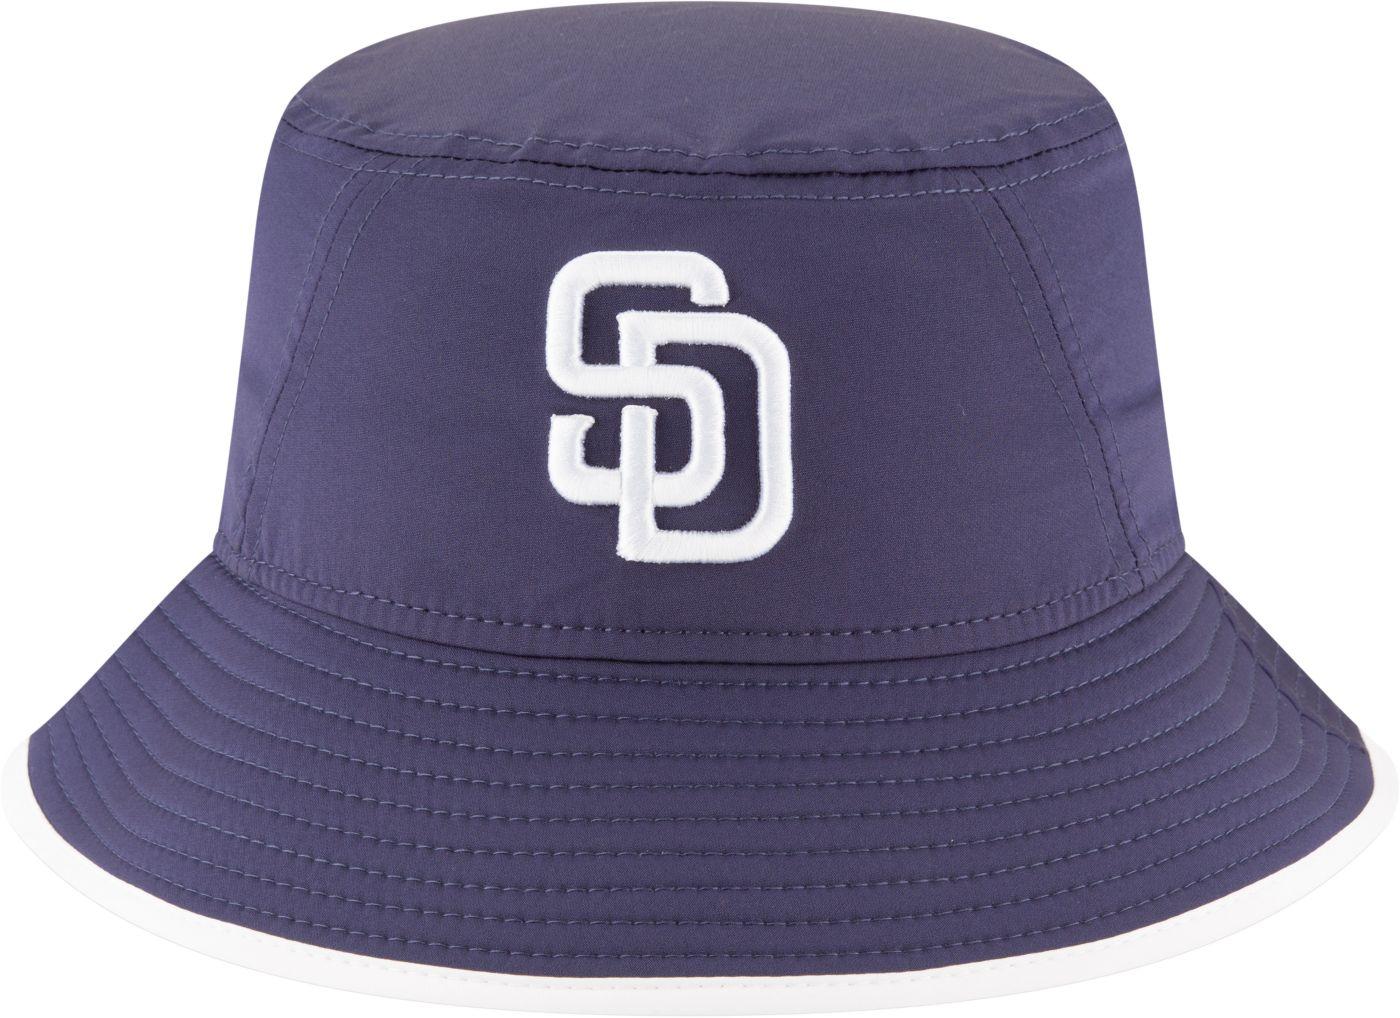 New Era Men's San Diego Padres Clubhouse Bucket Hat